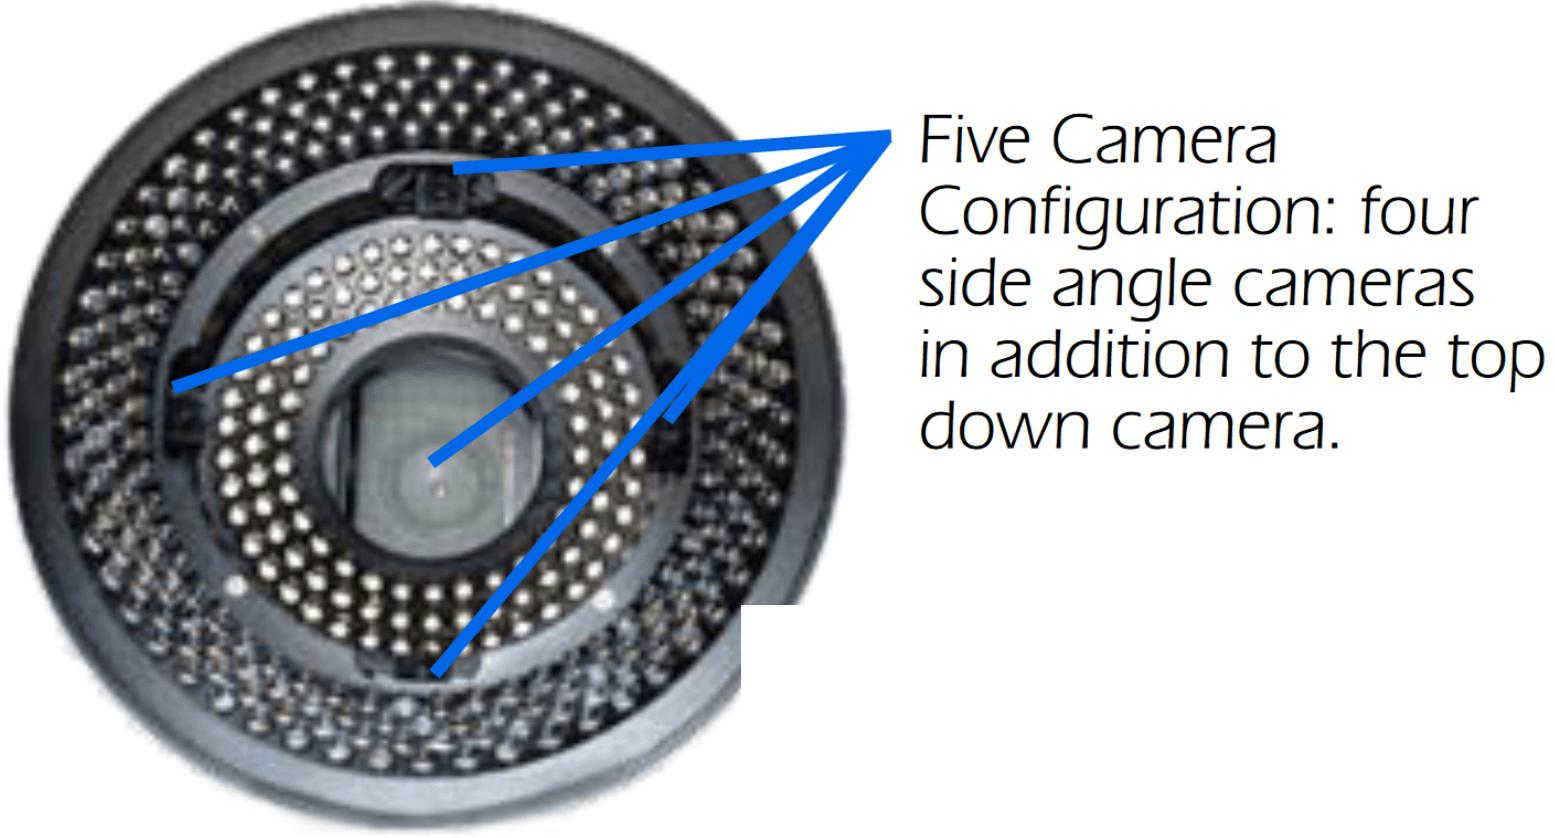 Five cameras in AOI